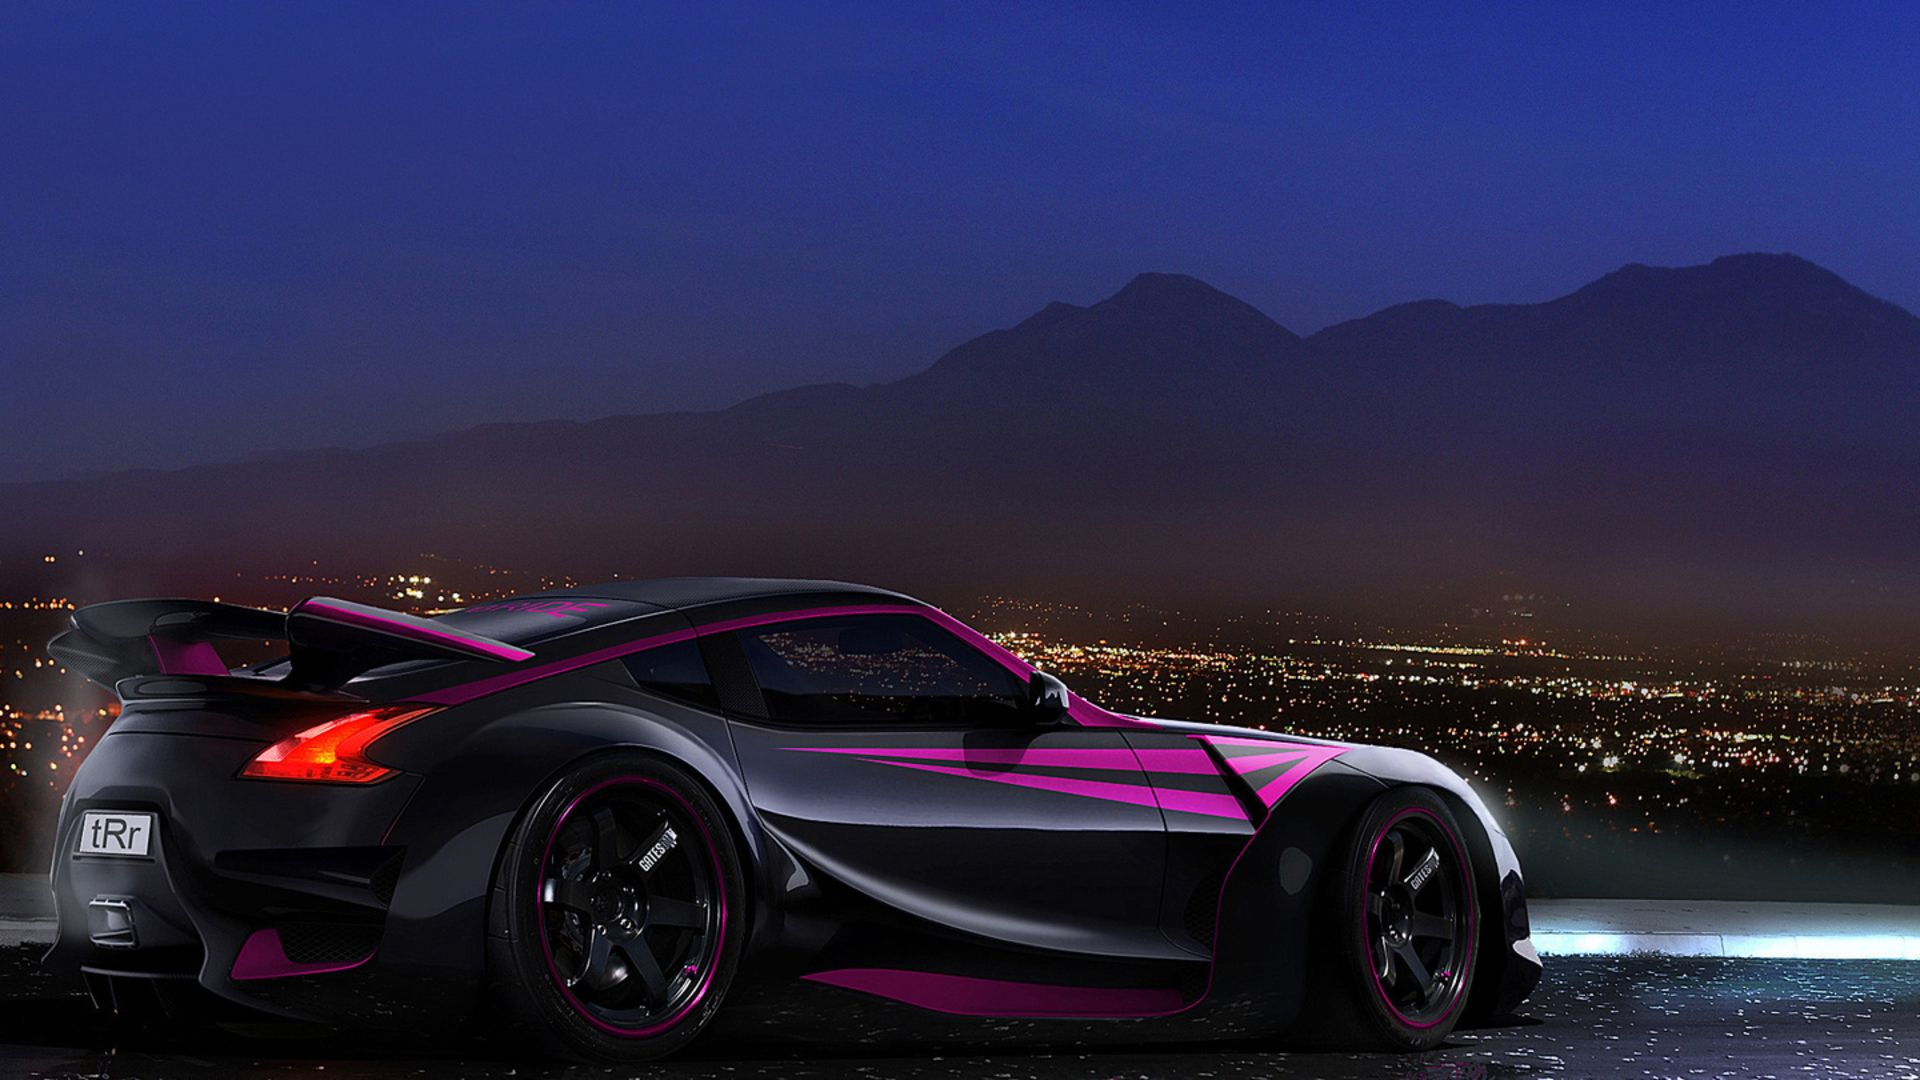 Hot custom car nissan 370z sport style black and purple line paint hot custom car nissan 370z sport style black and purple line paint vanachro Gallery